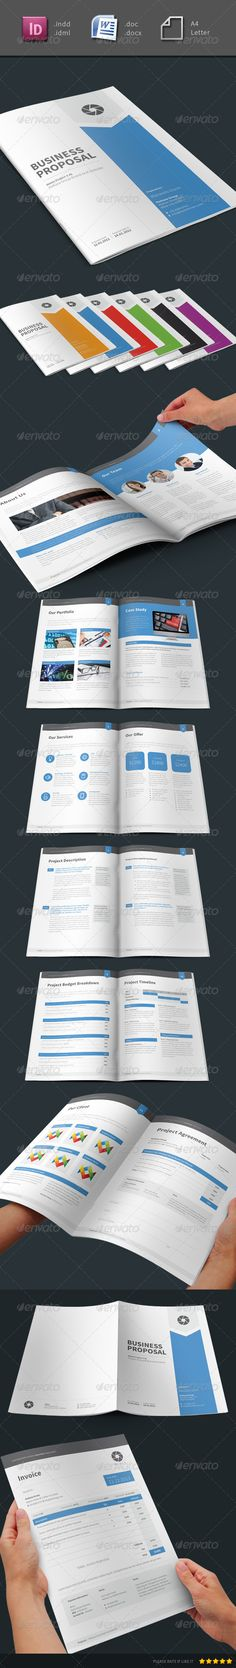 Clean Digital Marketing Proposal Digital marketing, Stationery - proposal word template